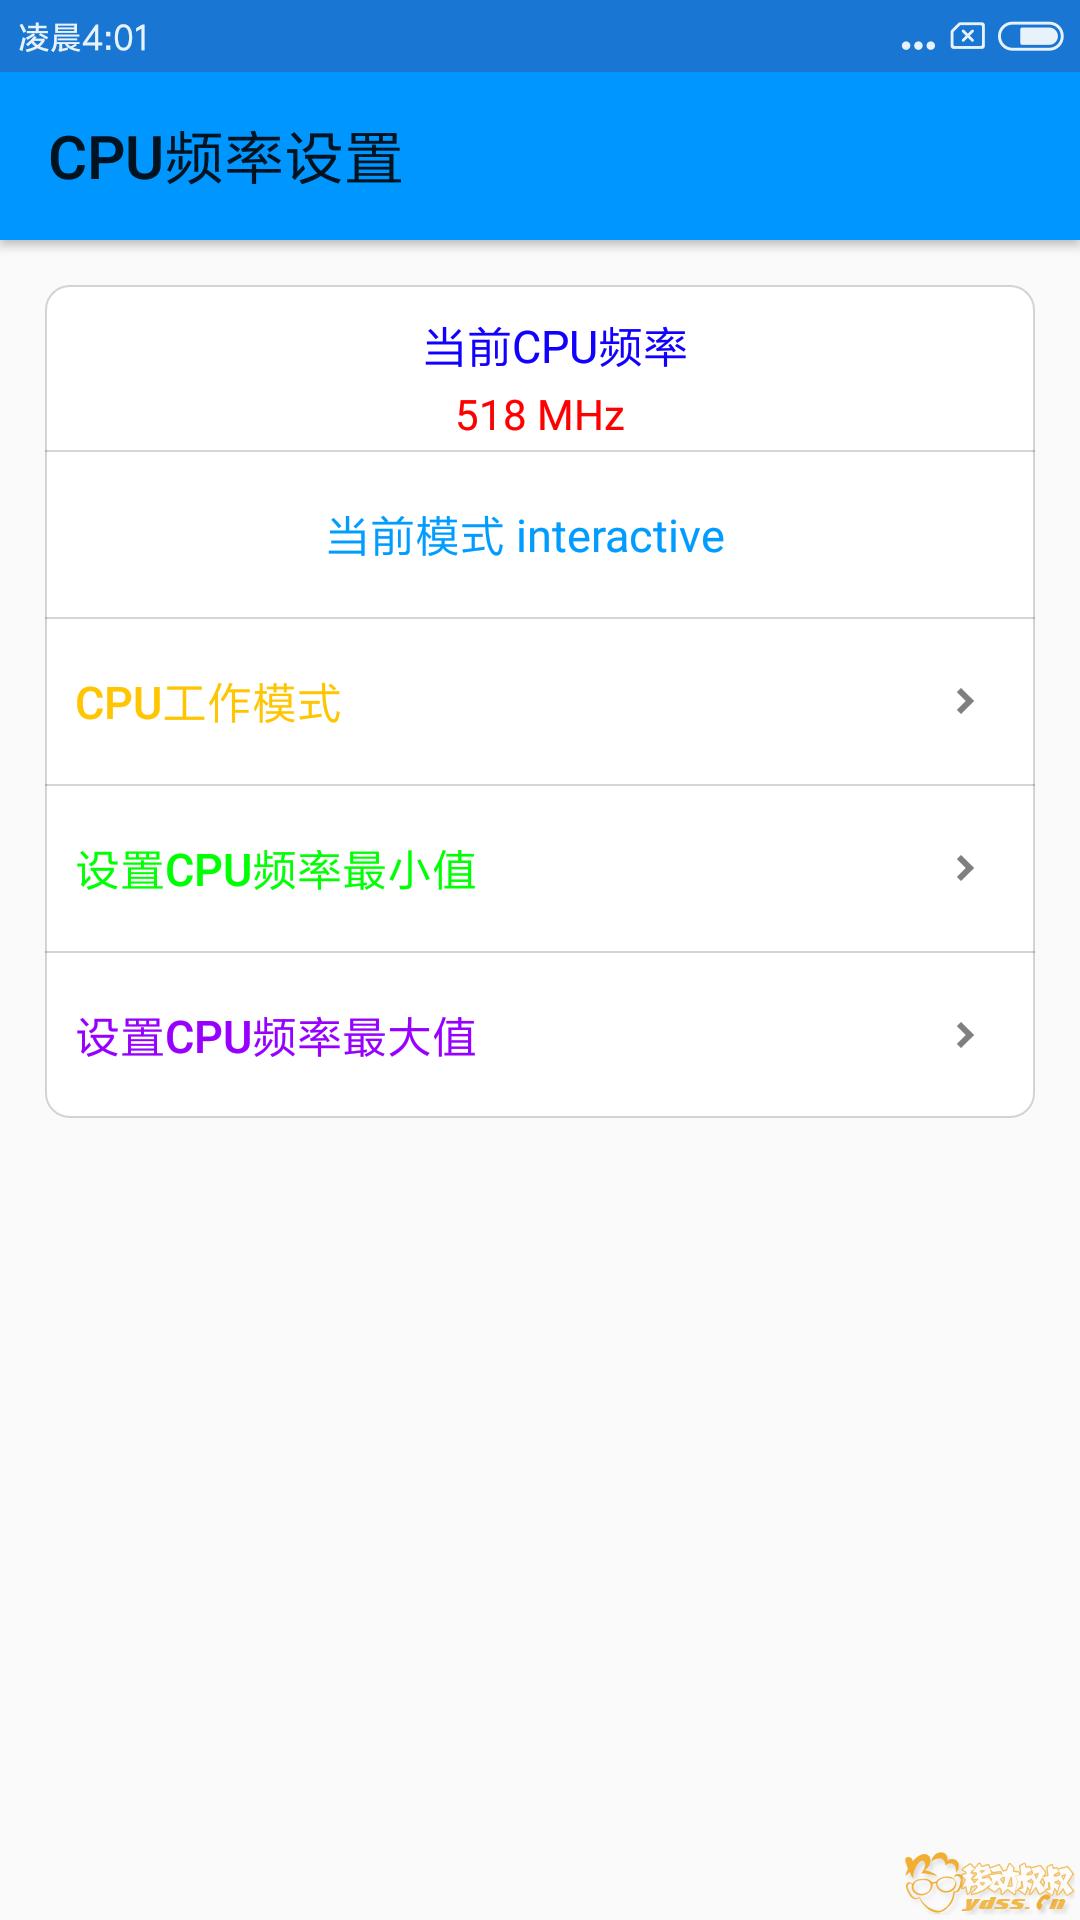 Screenshot_1971-03-29-04-01-16-118_com.zhanhong.tools.png